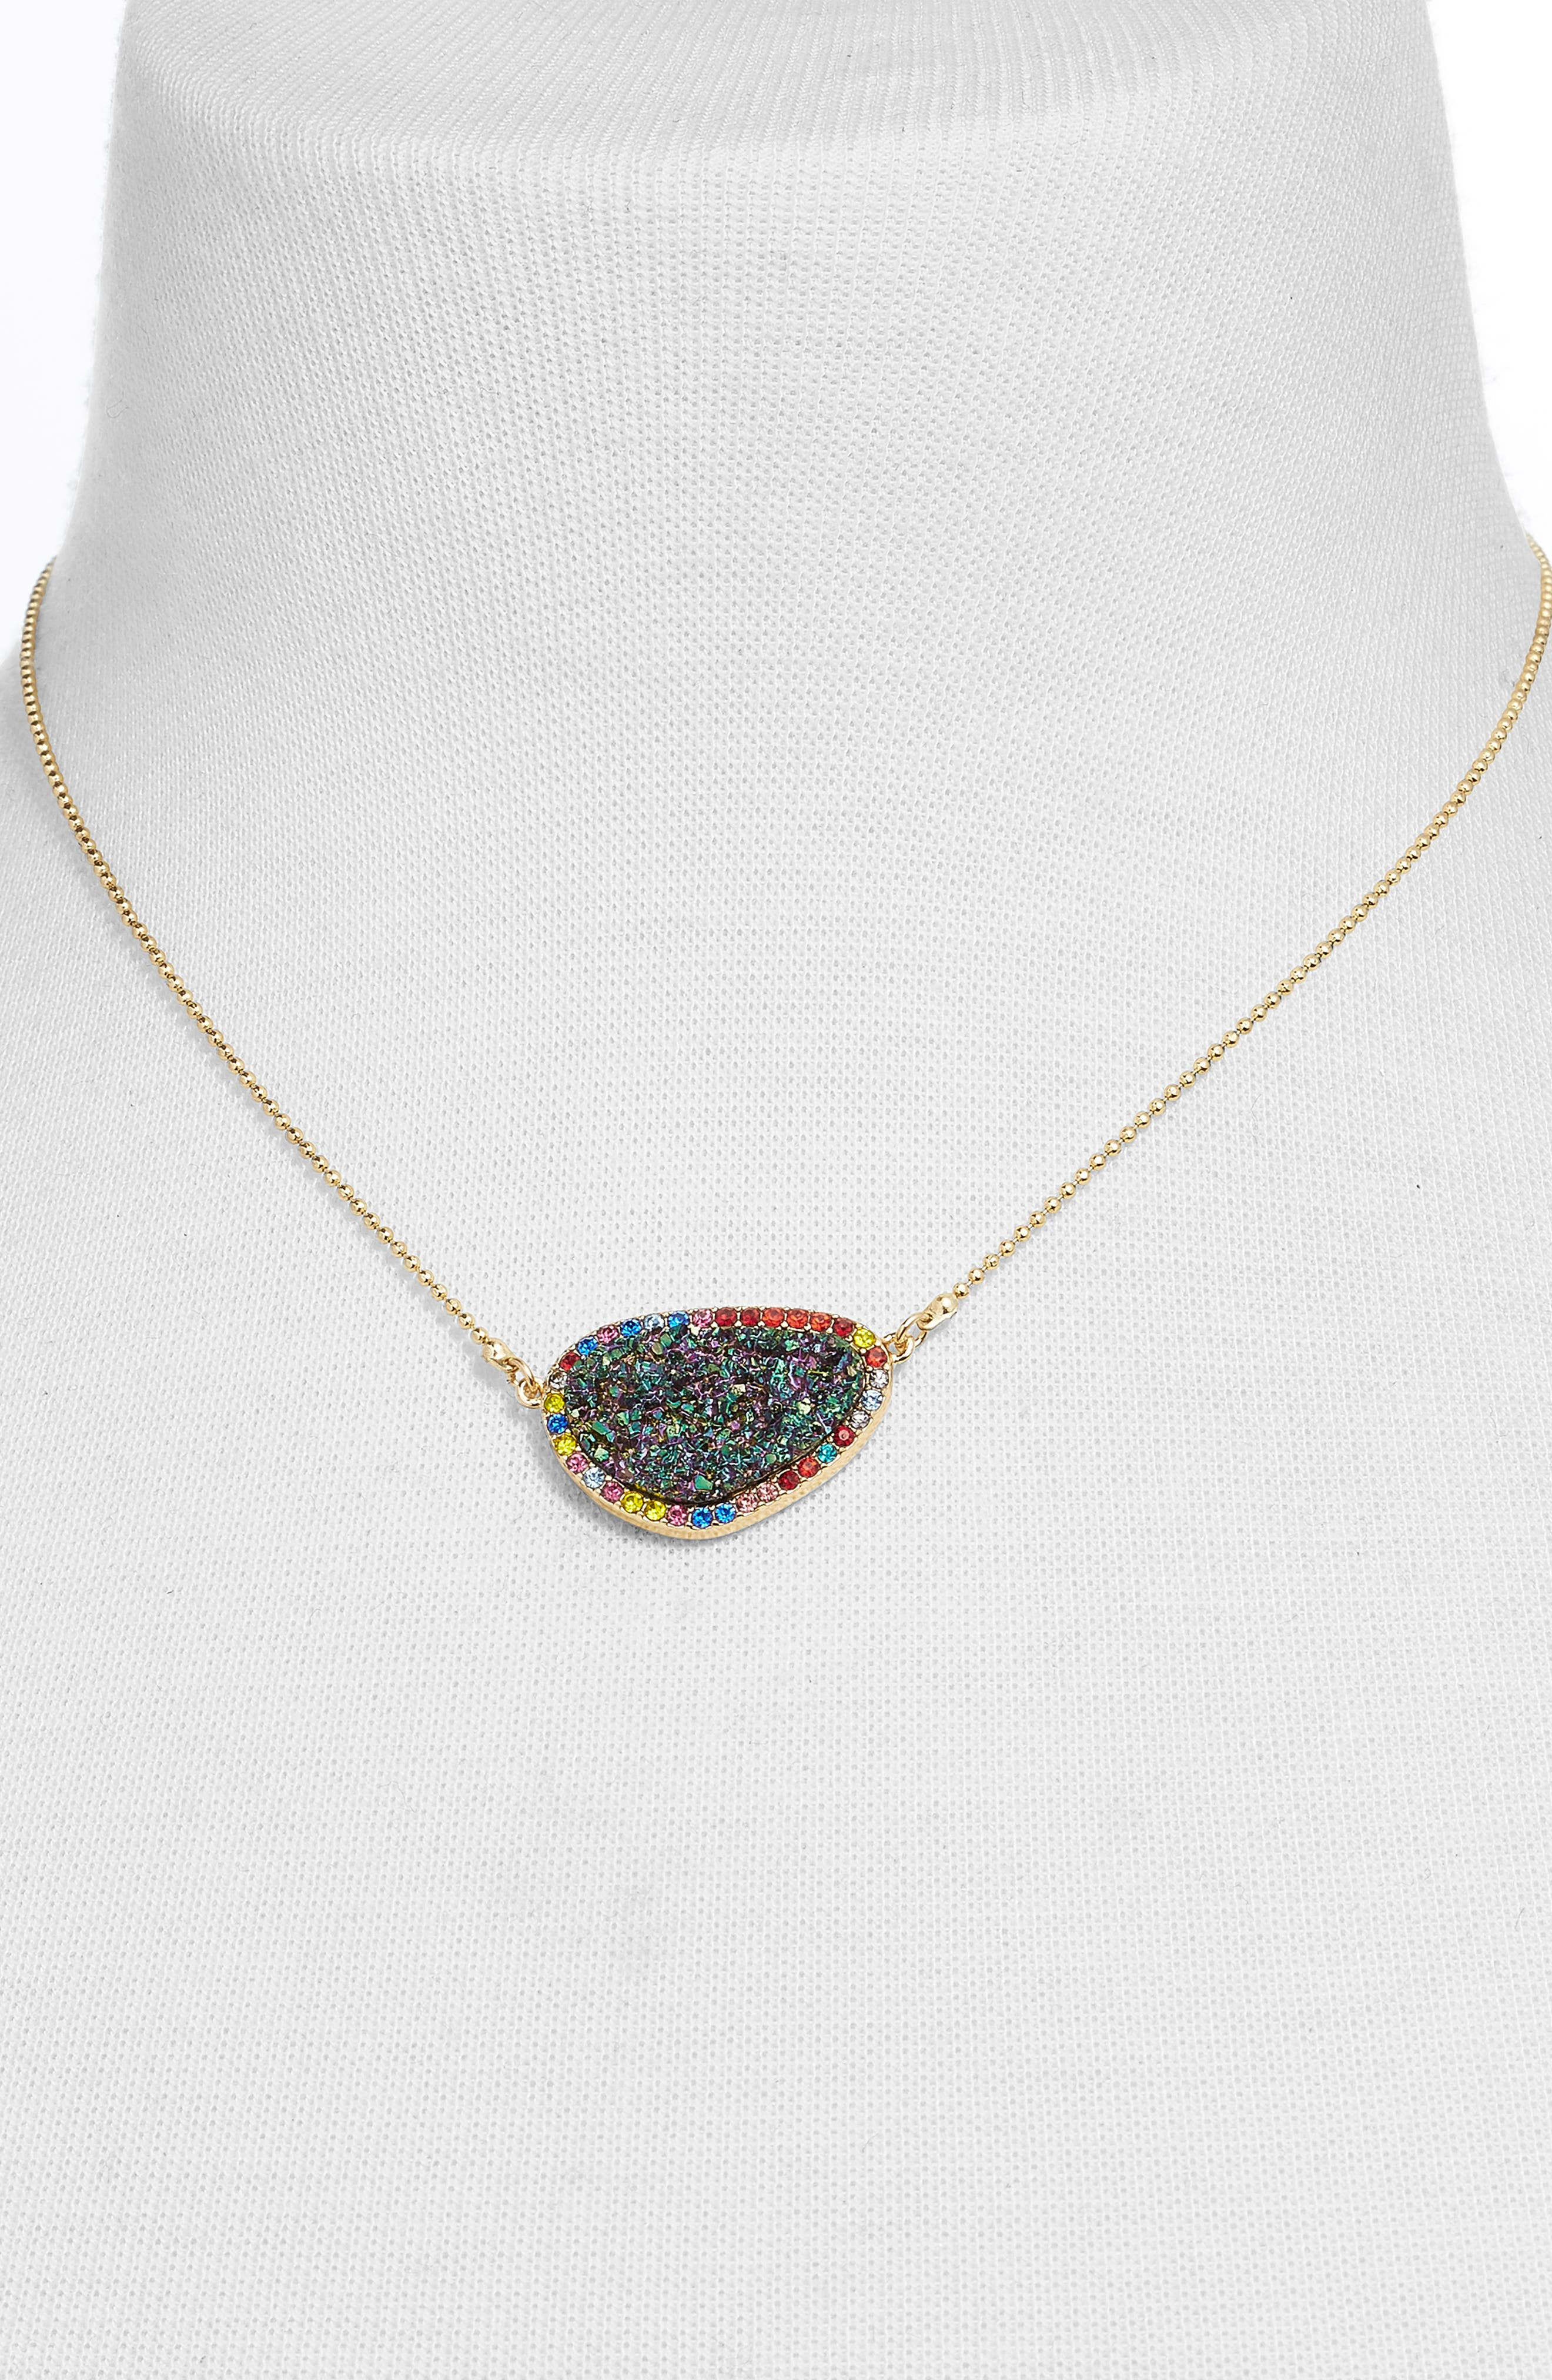 BAUBLEBAR,                             Kerisa Drusy Pendant Necklace,                             Alternate thumbnail 2, color,                             440